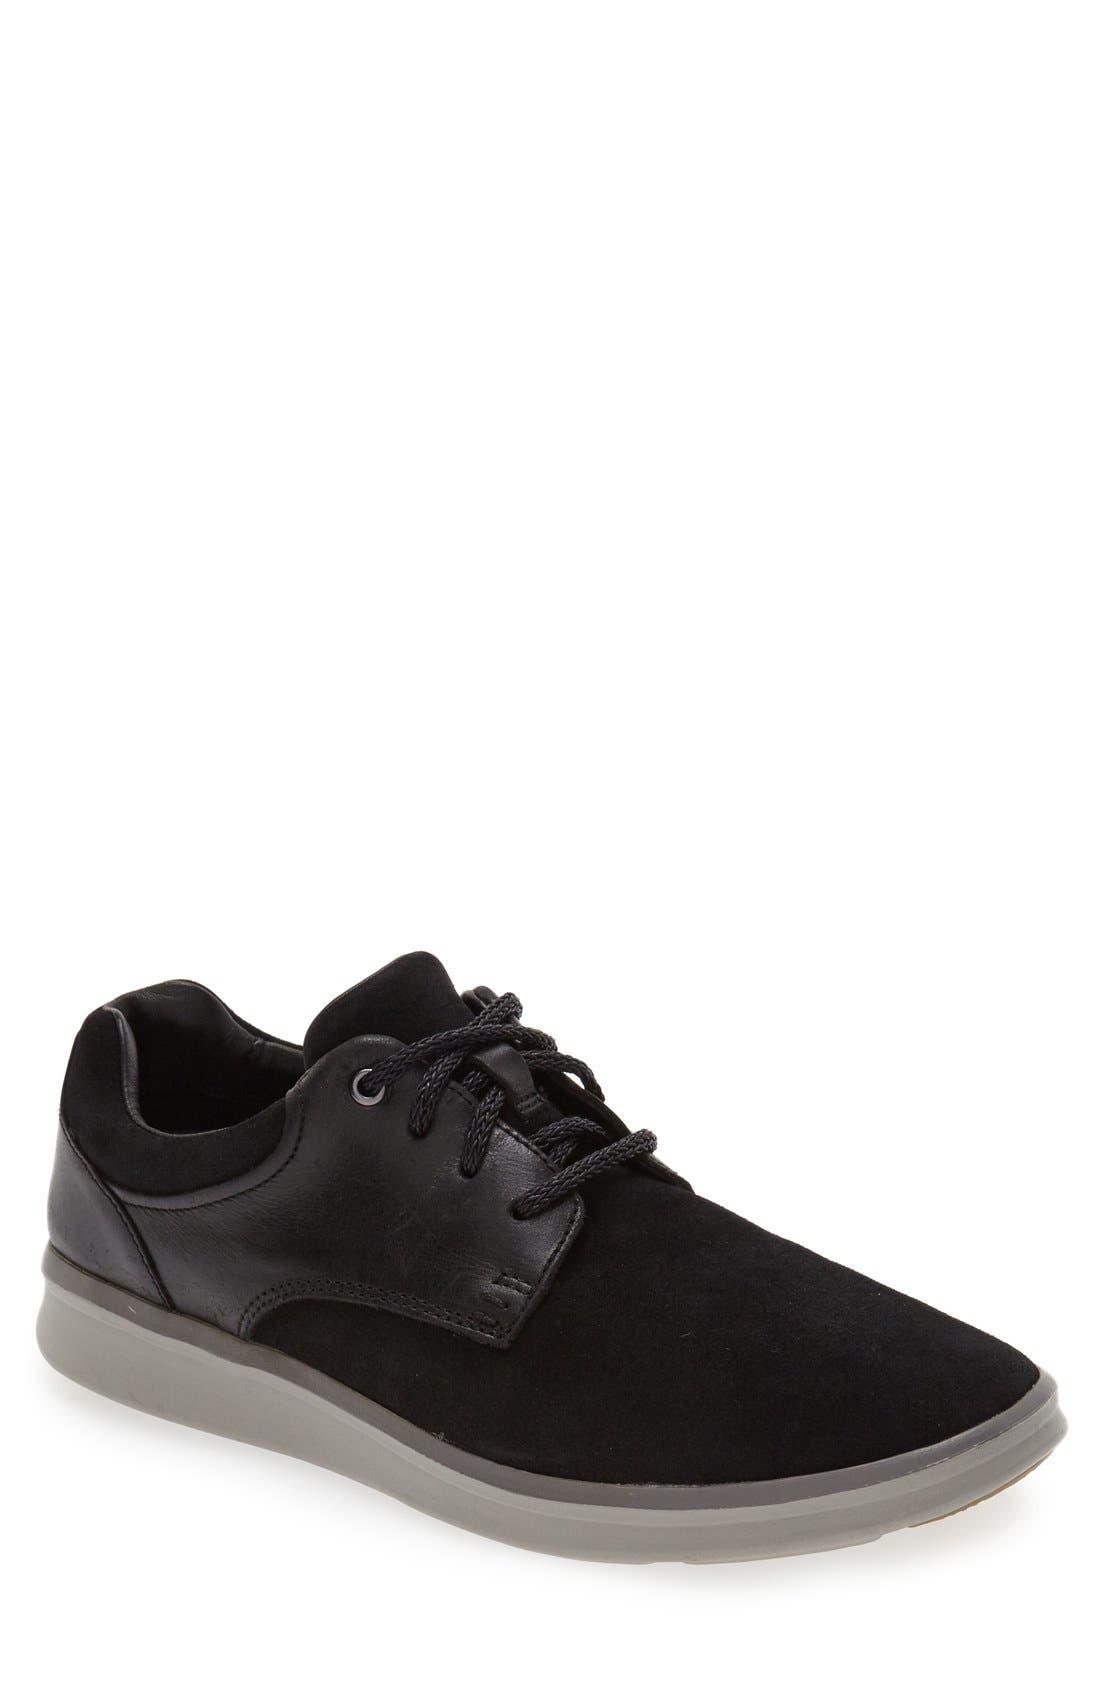 'Hepner' Sneaker,                             Main thumbnail 1, color,                             002